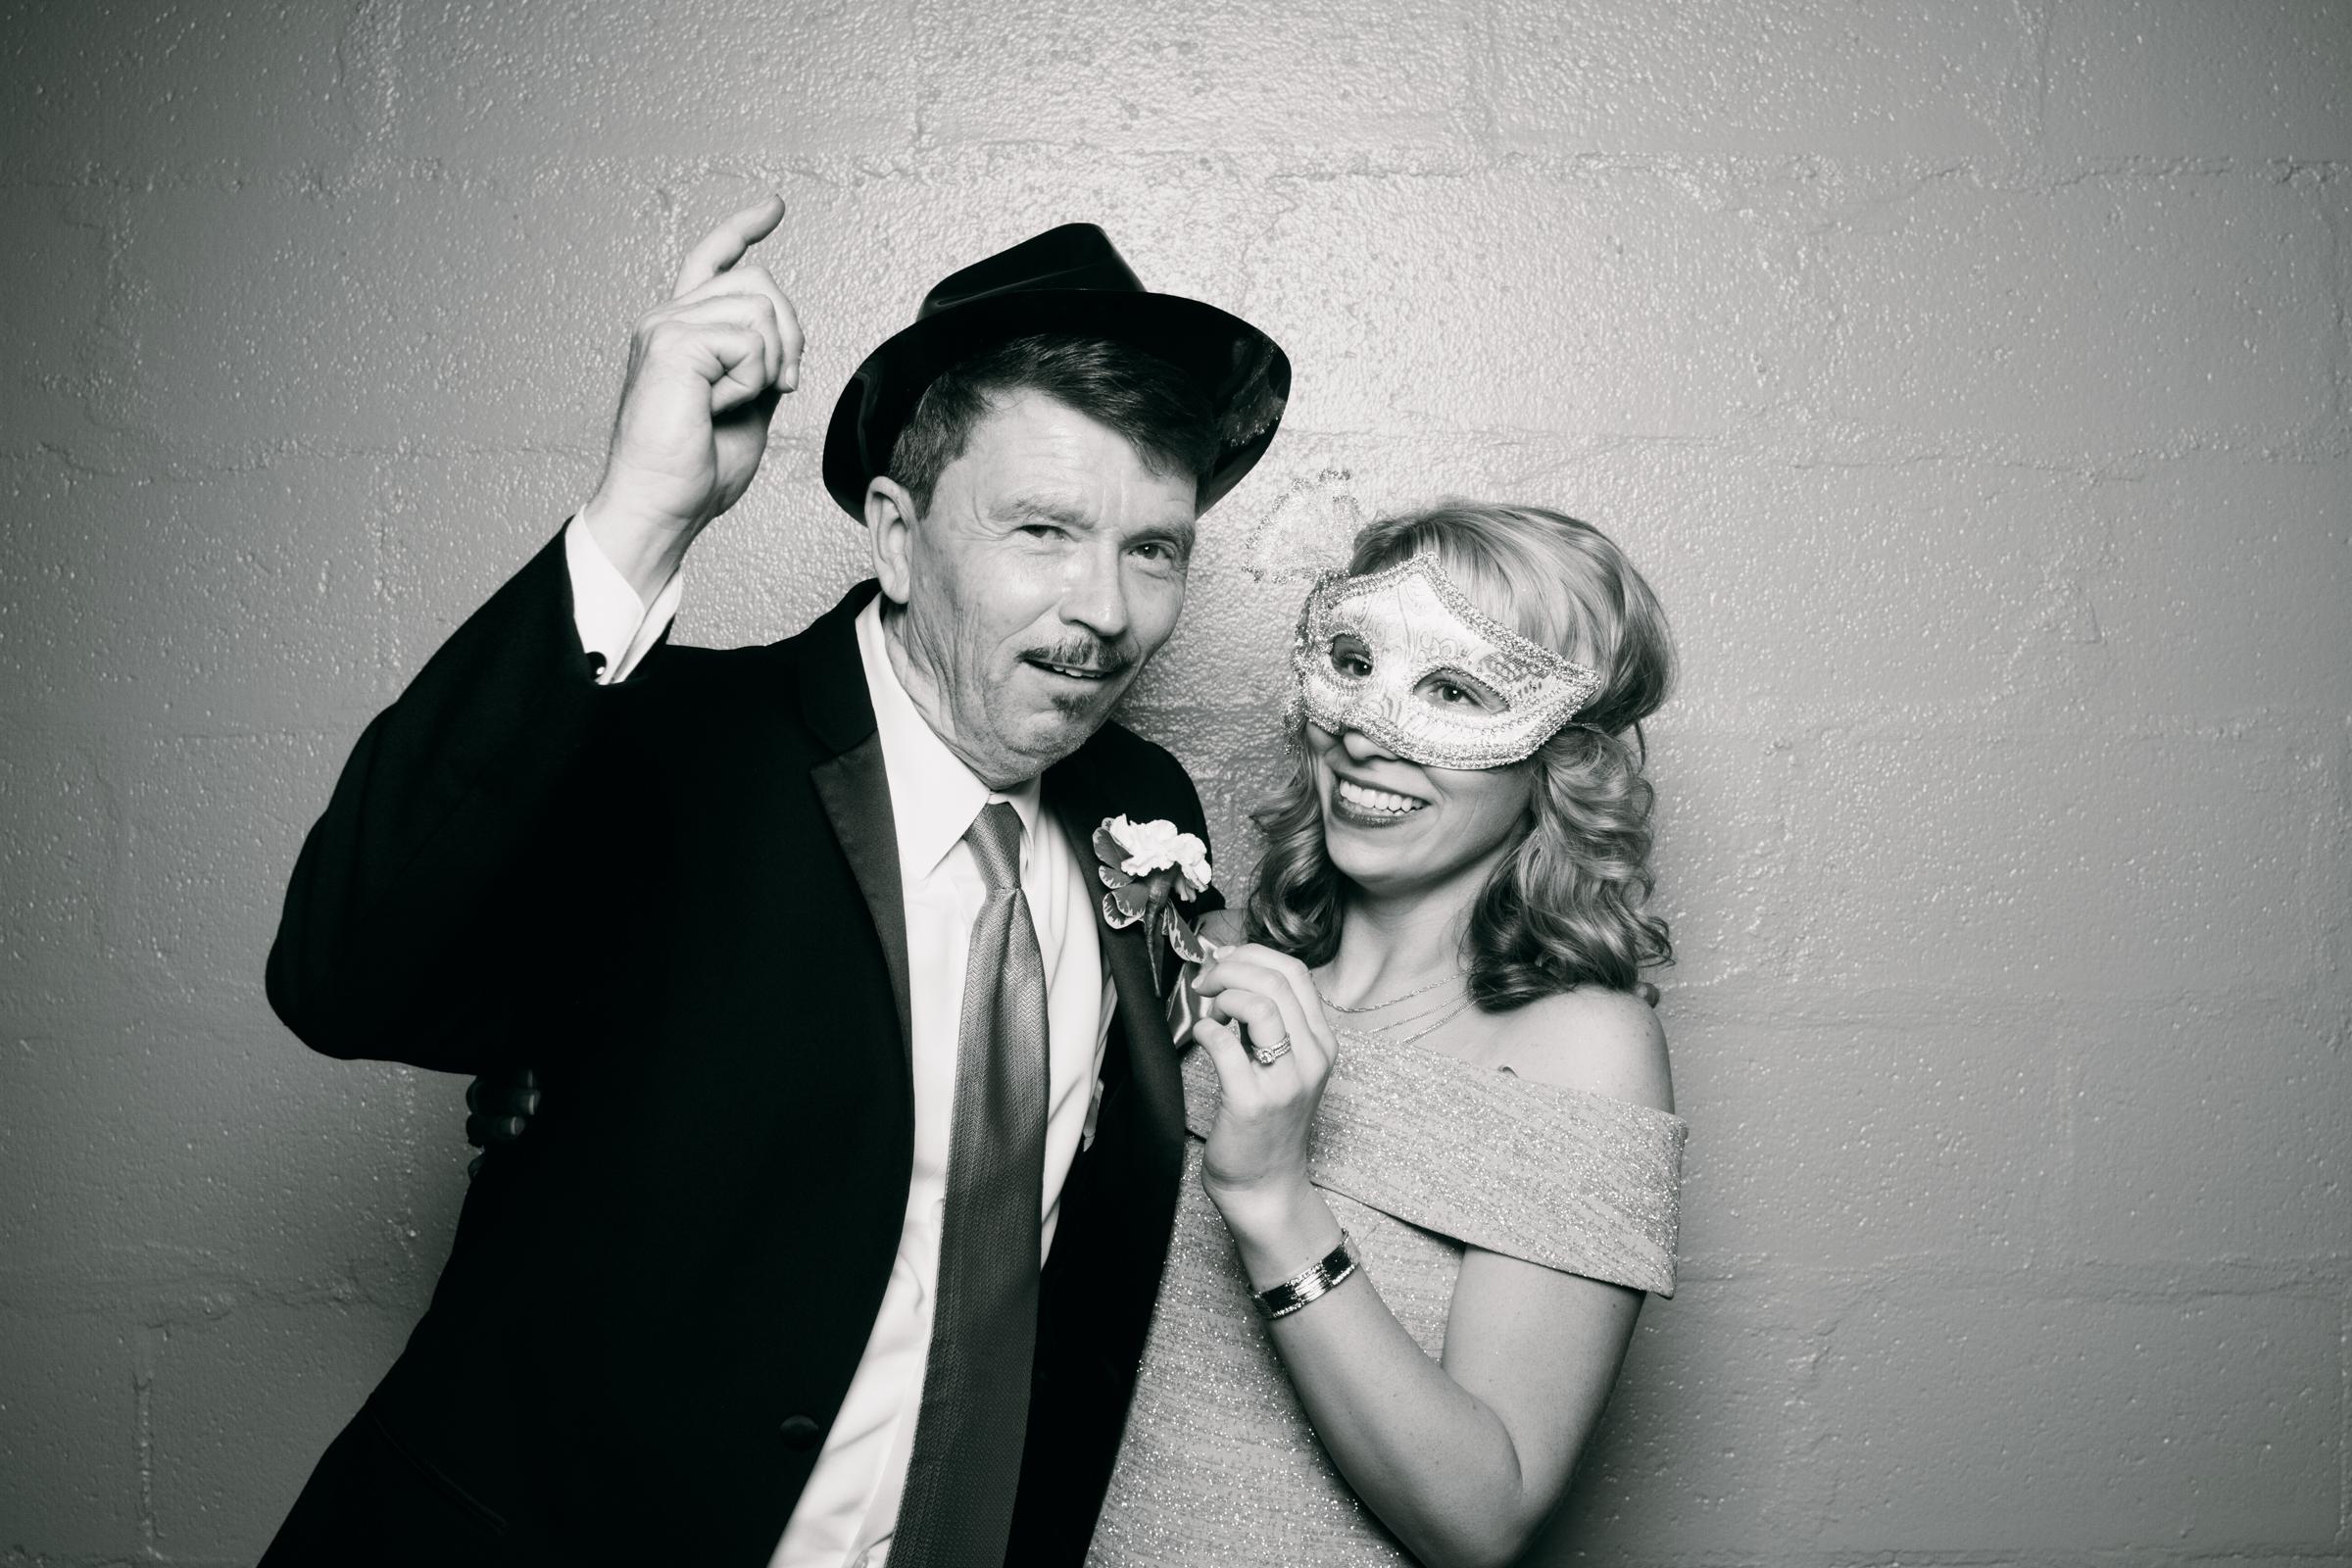 Ashley-John-Wedding-Photo-Booth-24.jpg